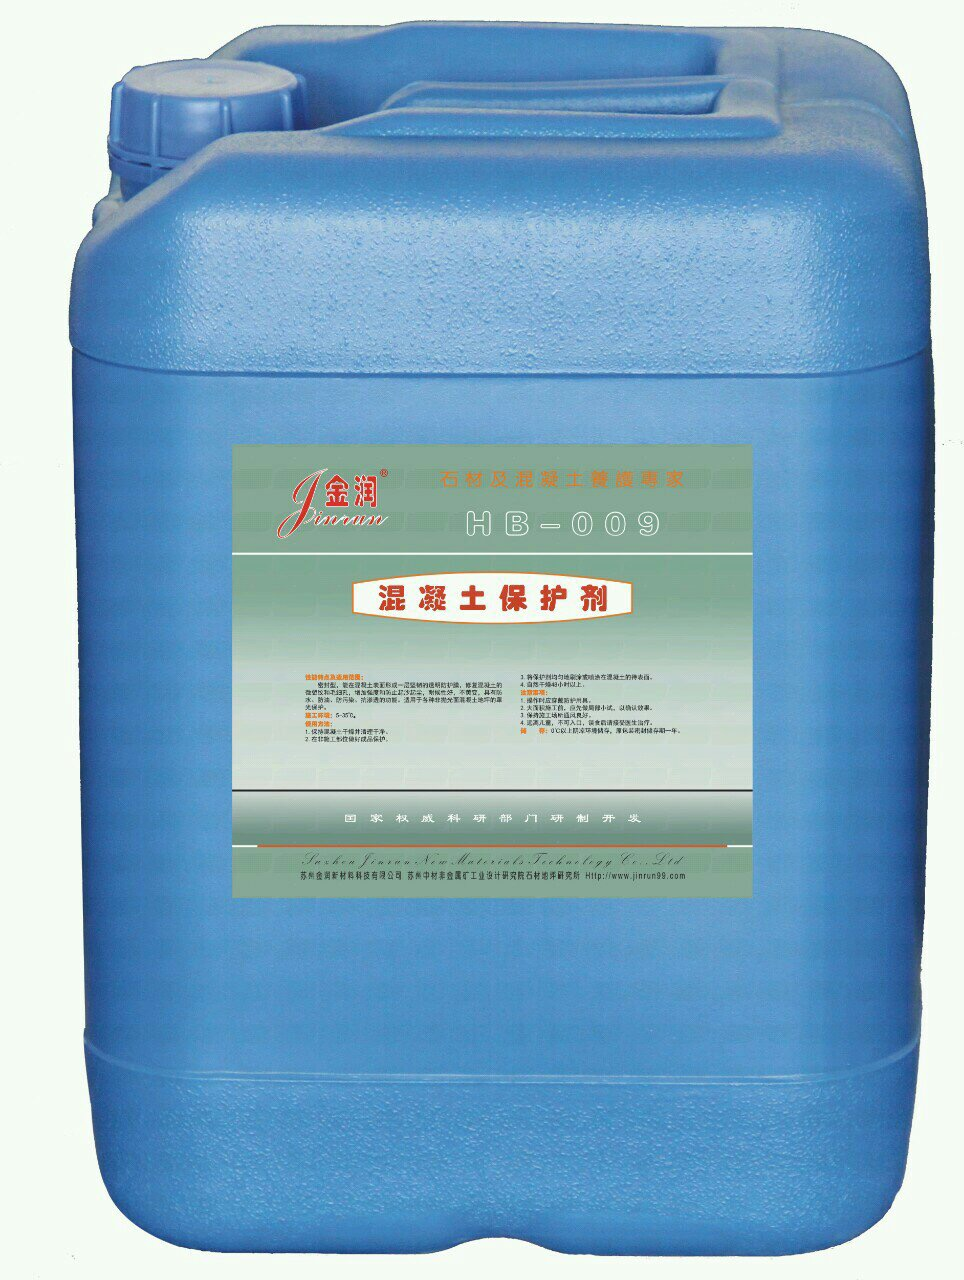 HB-009-混凝土保护剂